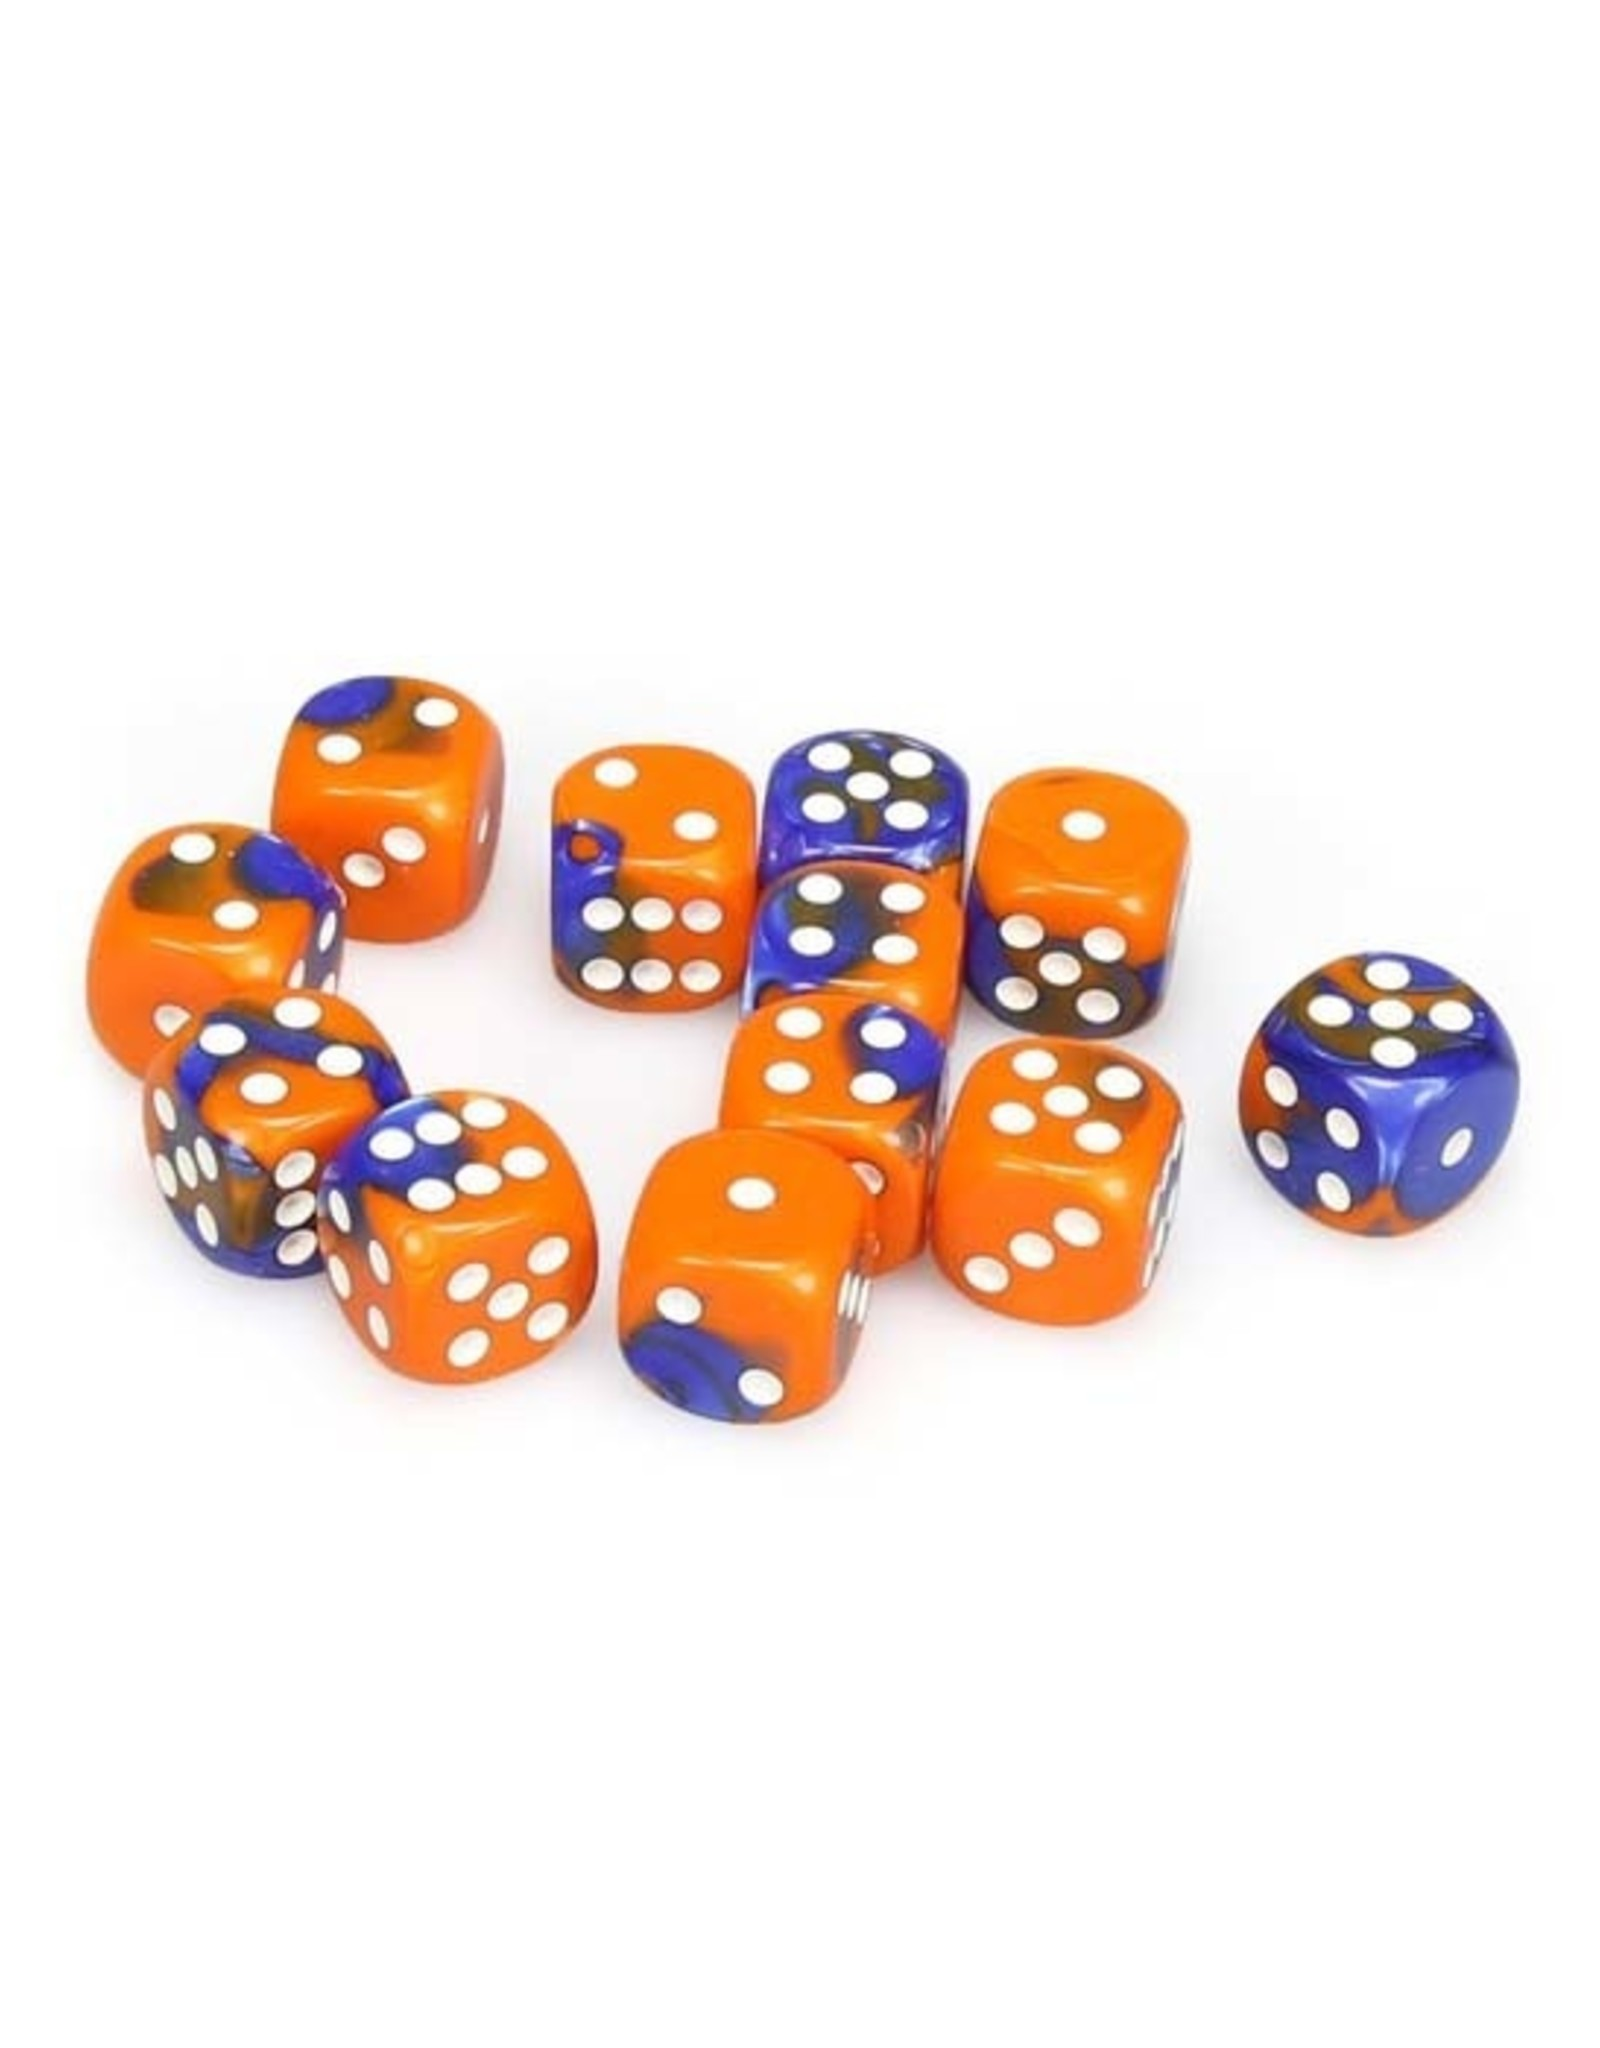 Chessex Chessex: 16mm D6 - Gemini - Blue-Orange w/ White